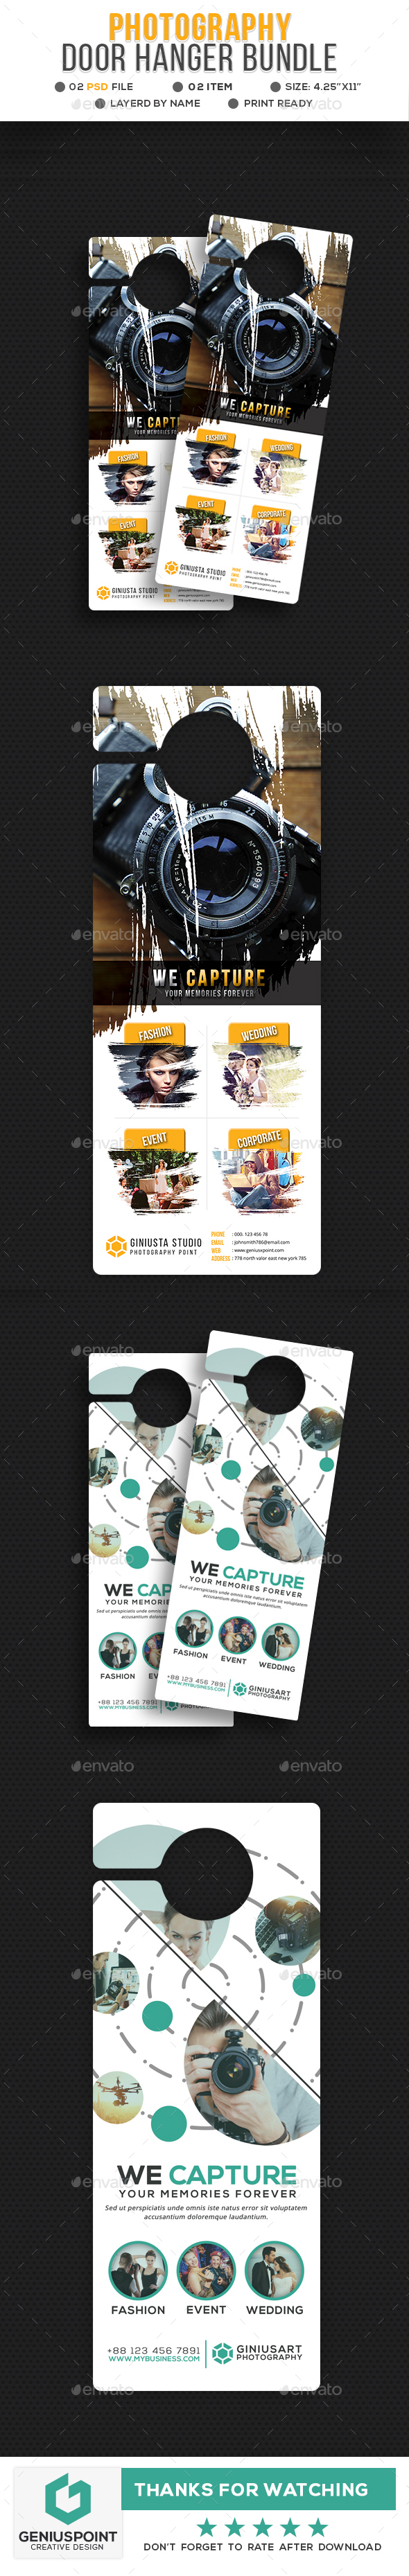 Photography Door Hanger Bundle - Miscellaneous Print Templates